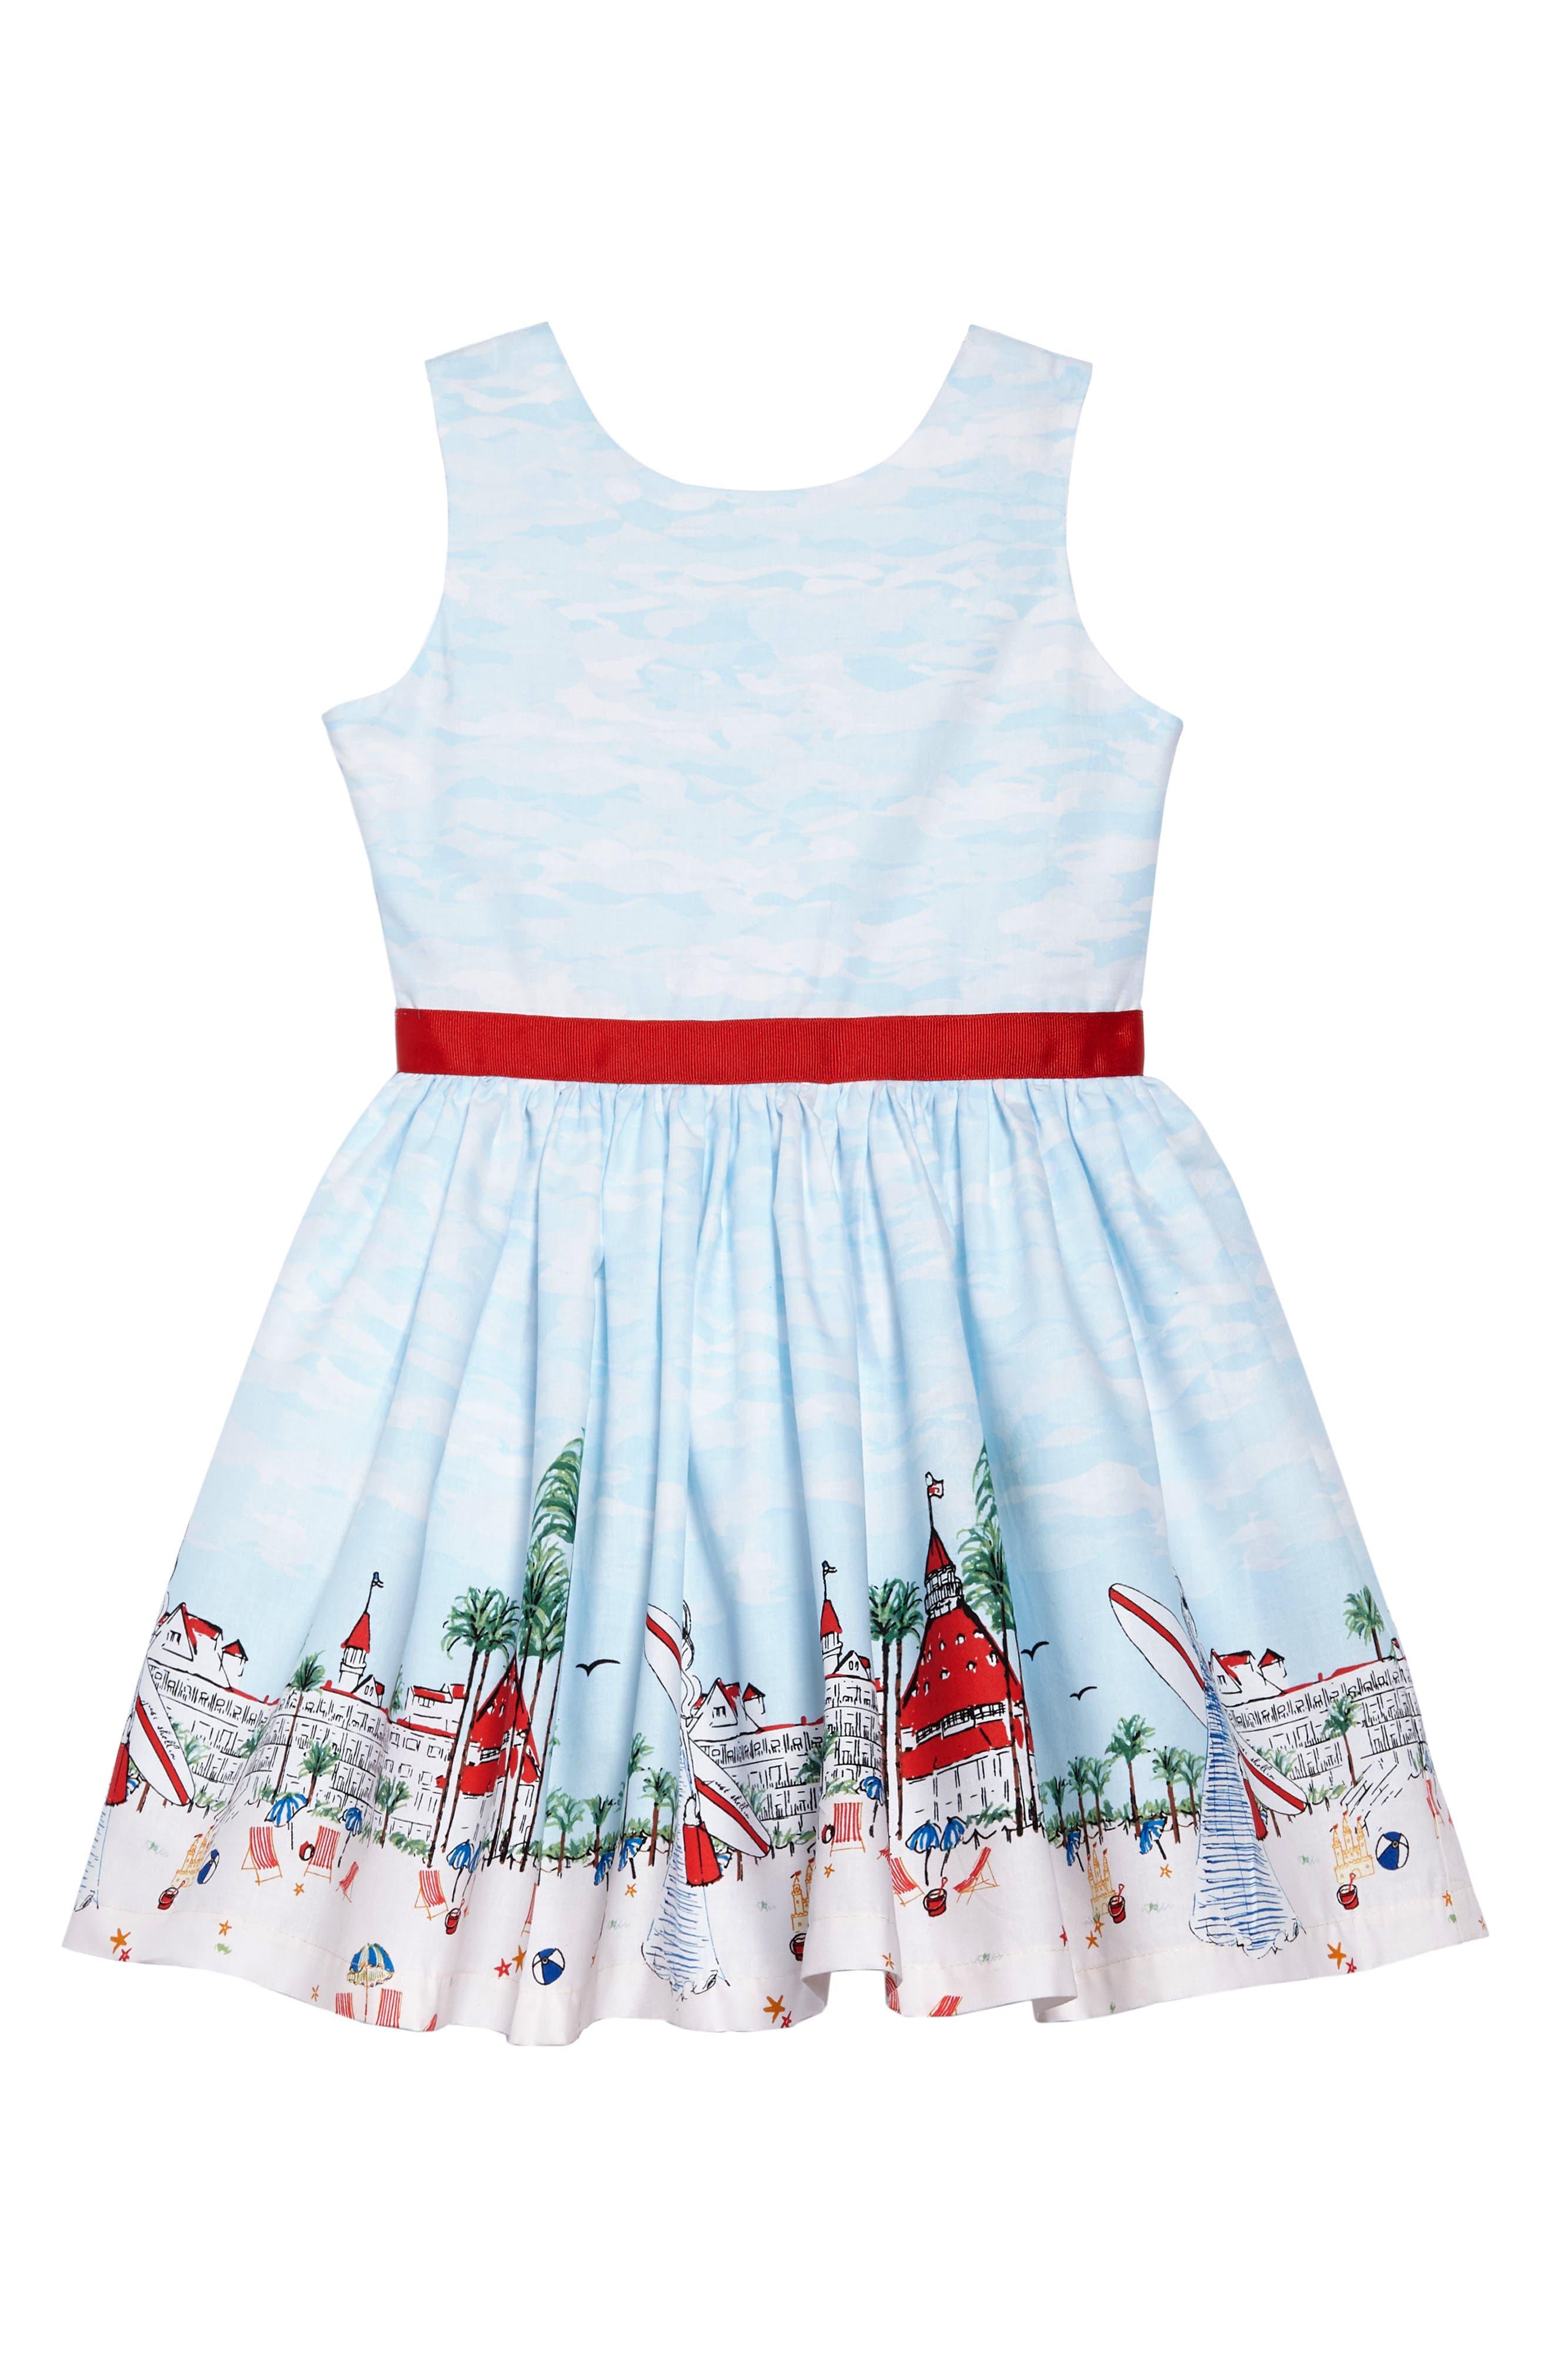 Just Shellin Party Dress,                             Main thumbnail 1, color,                             100